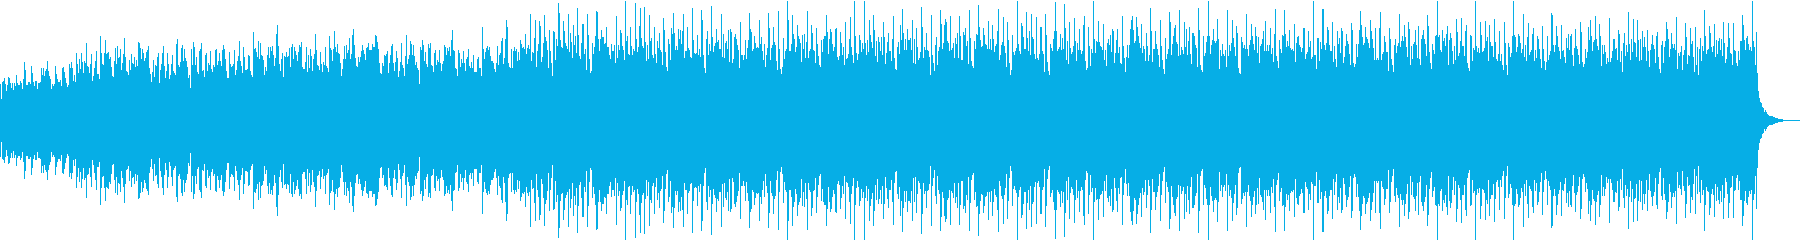 Pop with impressive piano / cosmic disco 's reproduced waveform